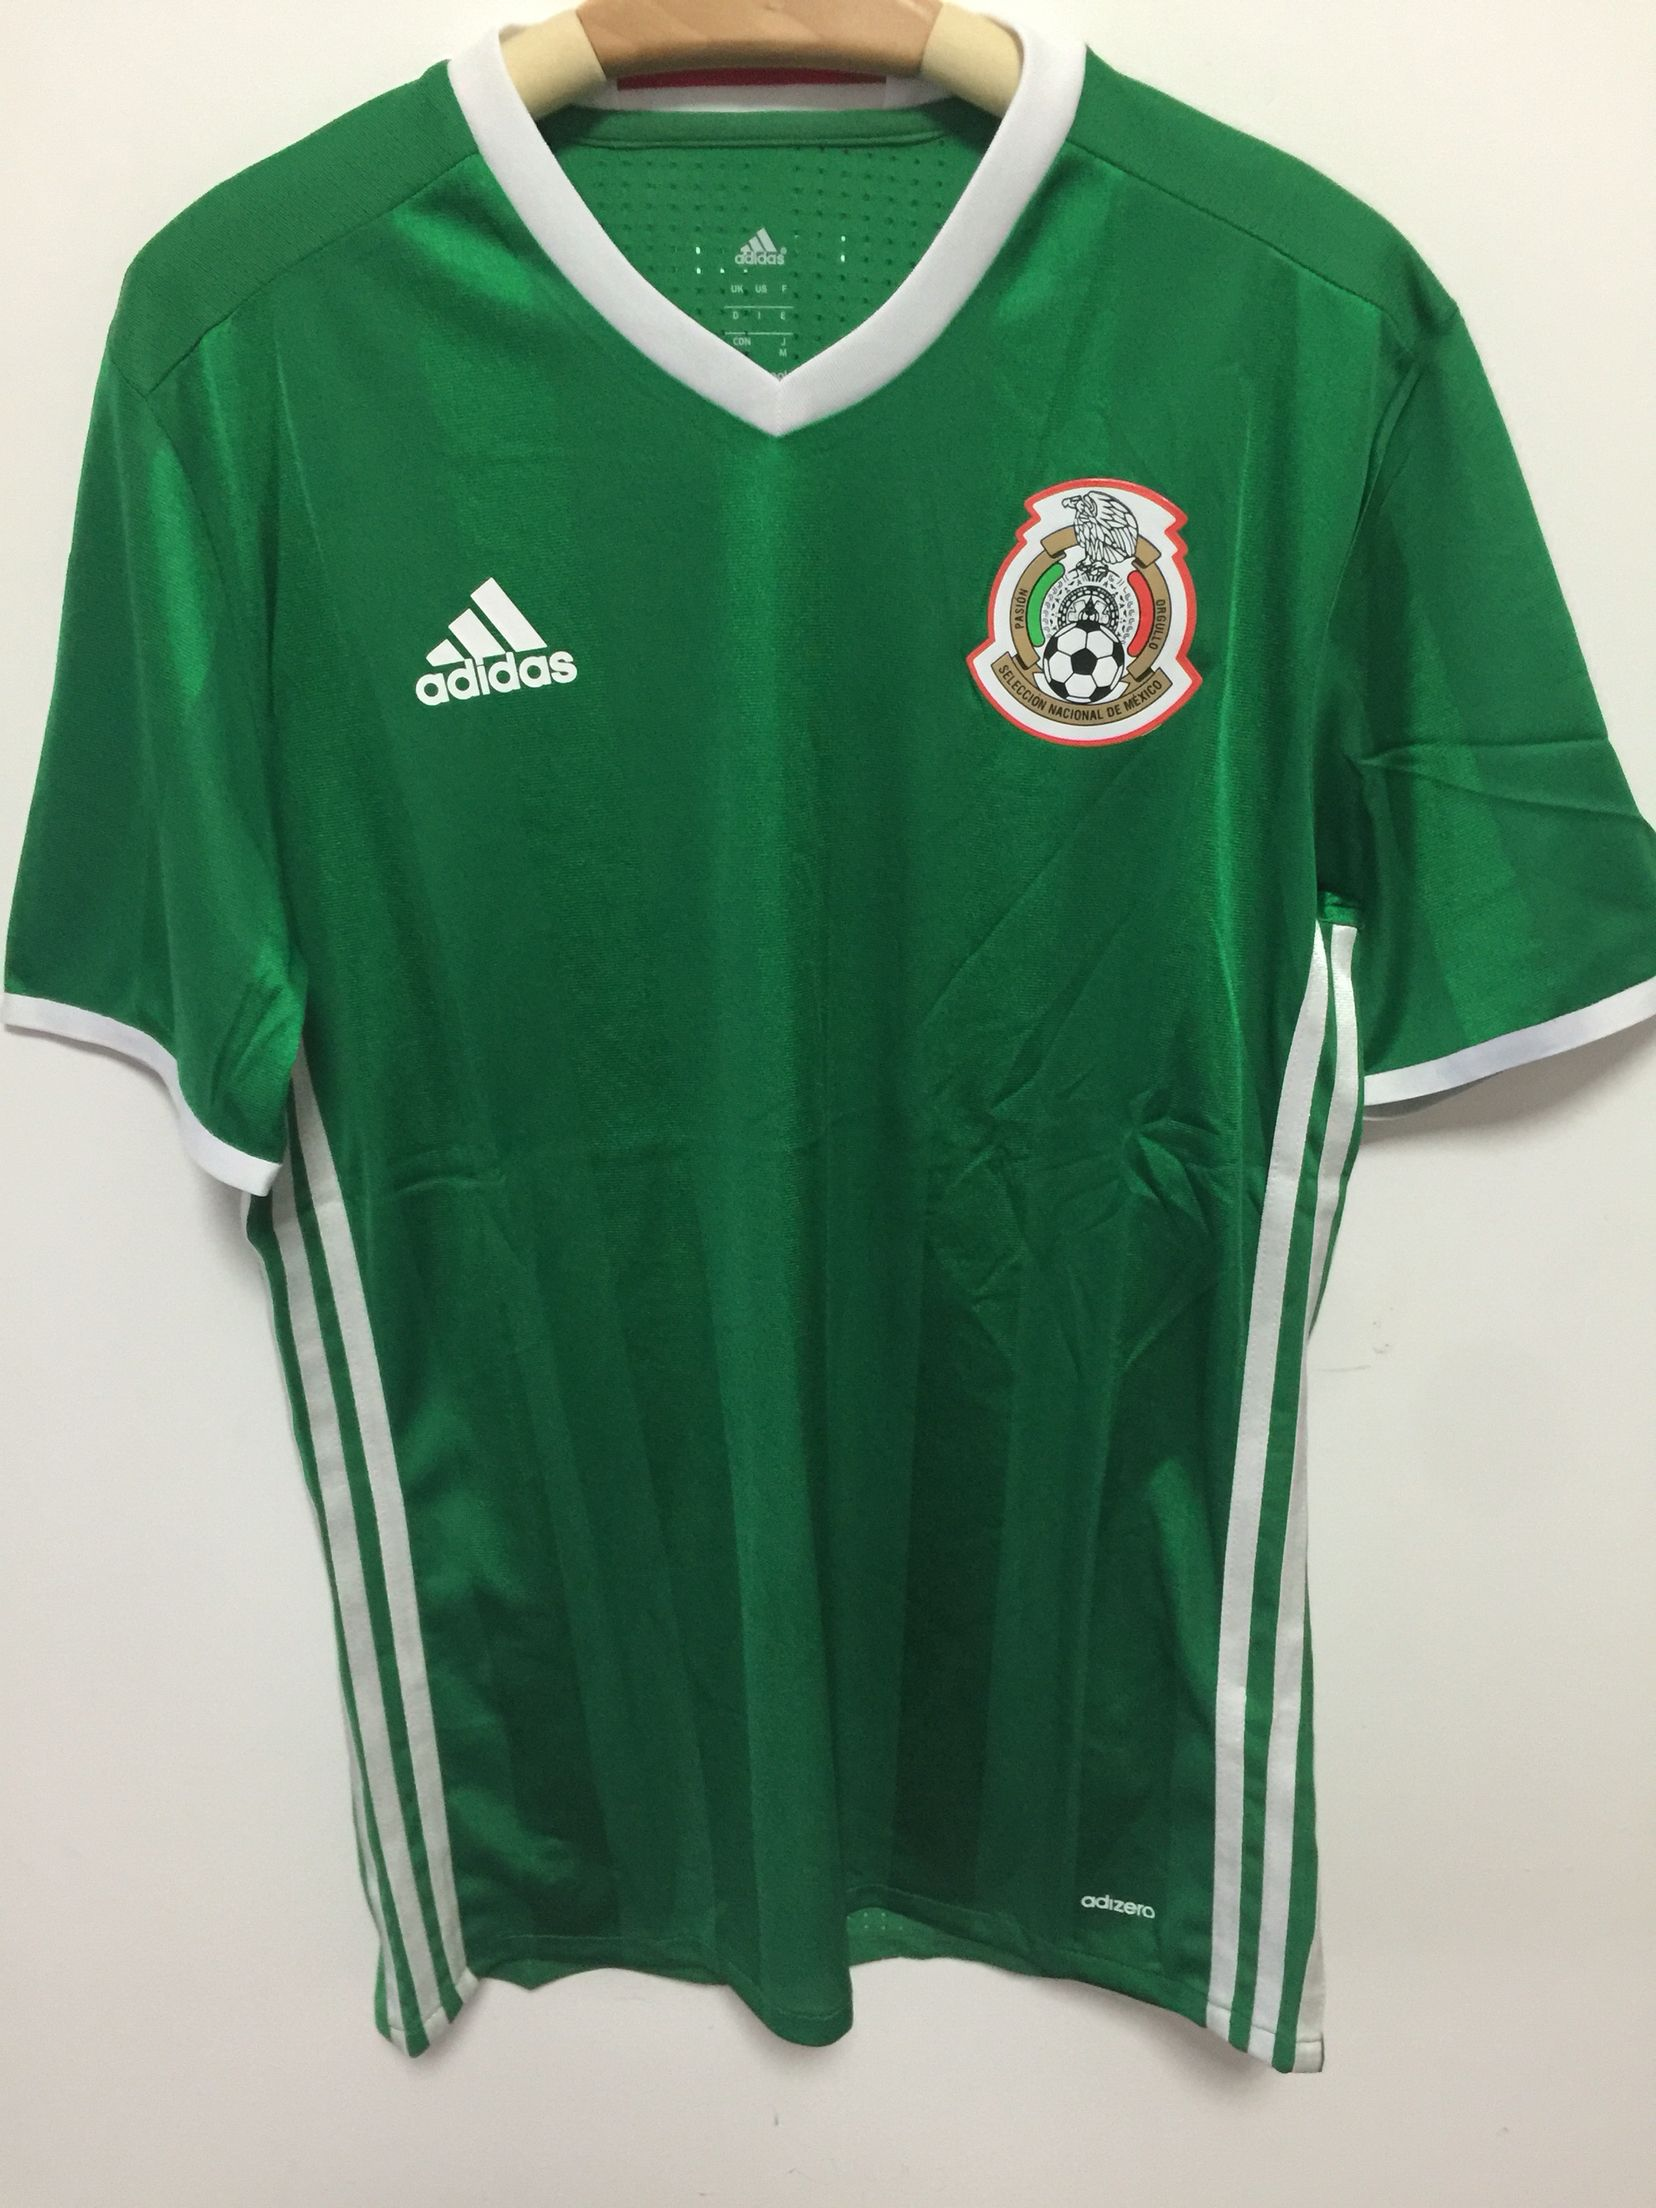 fca799f64 Mexico 2016 copa America centenario home jersey player version ...